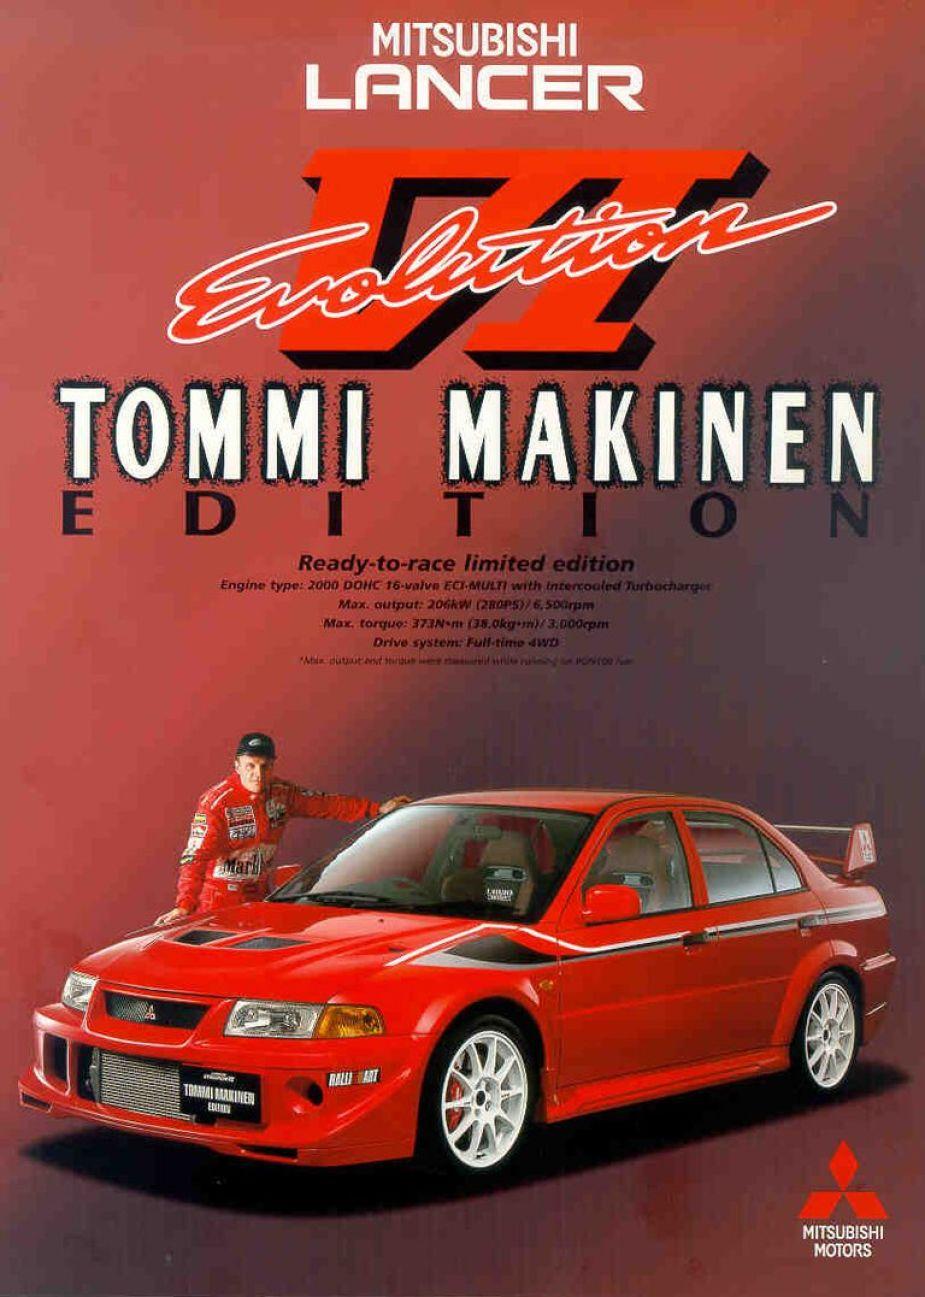 Tommi Mäkinen Evolution VI